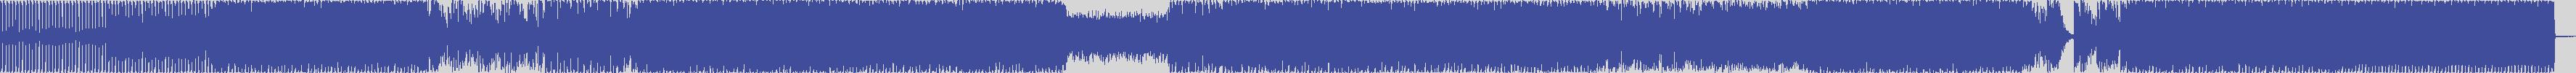 just_digital_records [JS1143] Homeboyz - Crazy Dj [Djrobber Mix] audio wave form